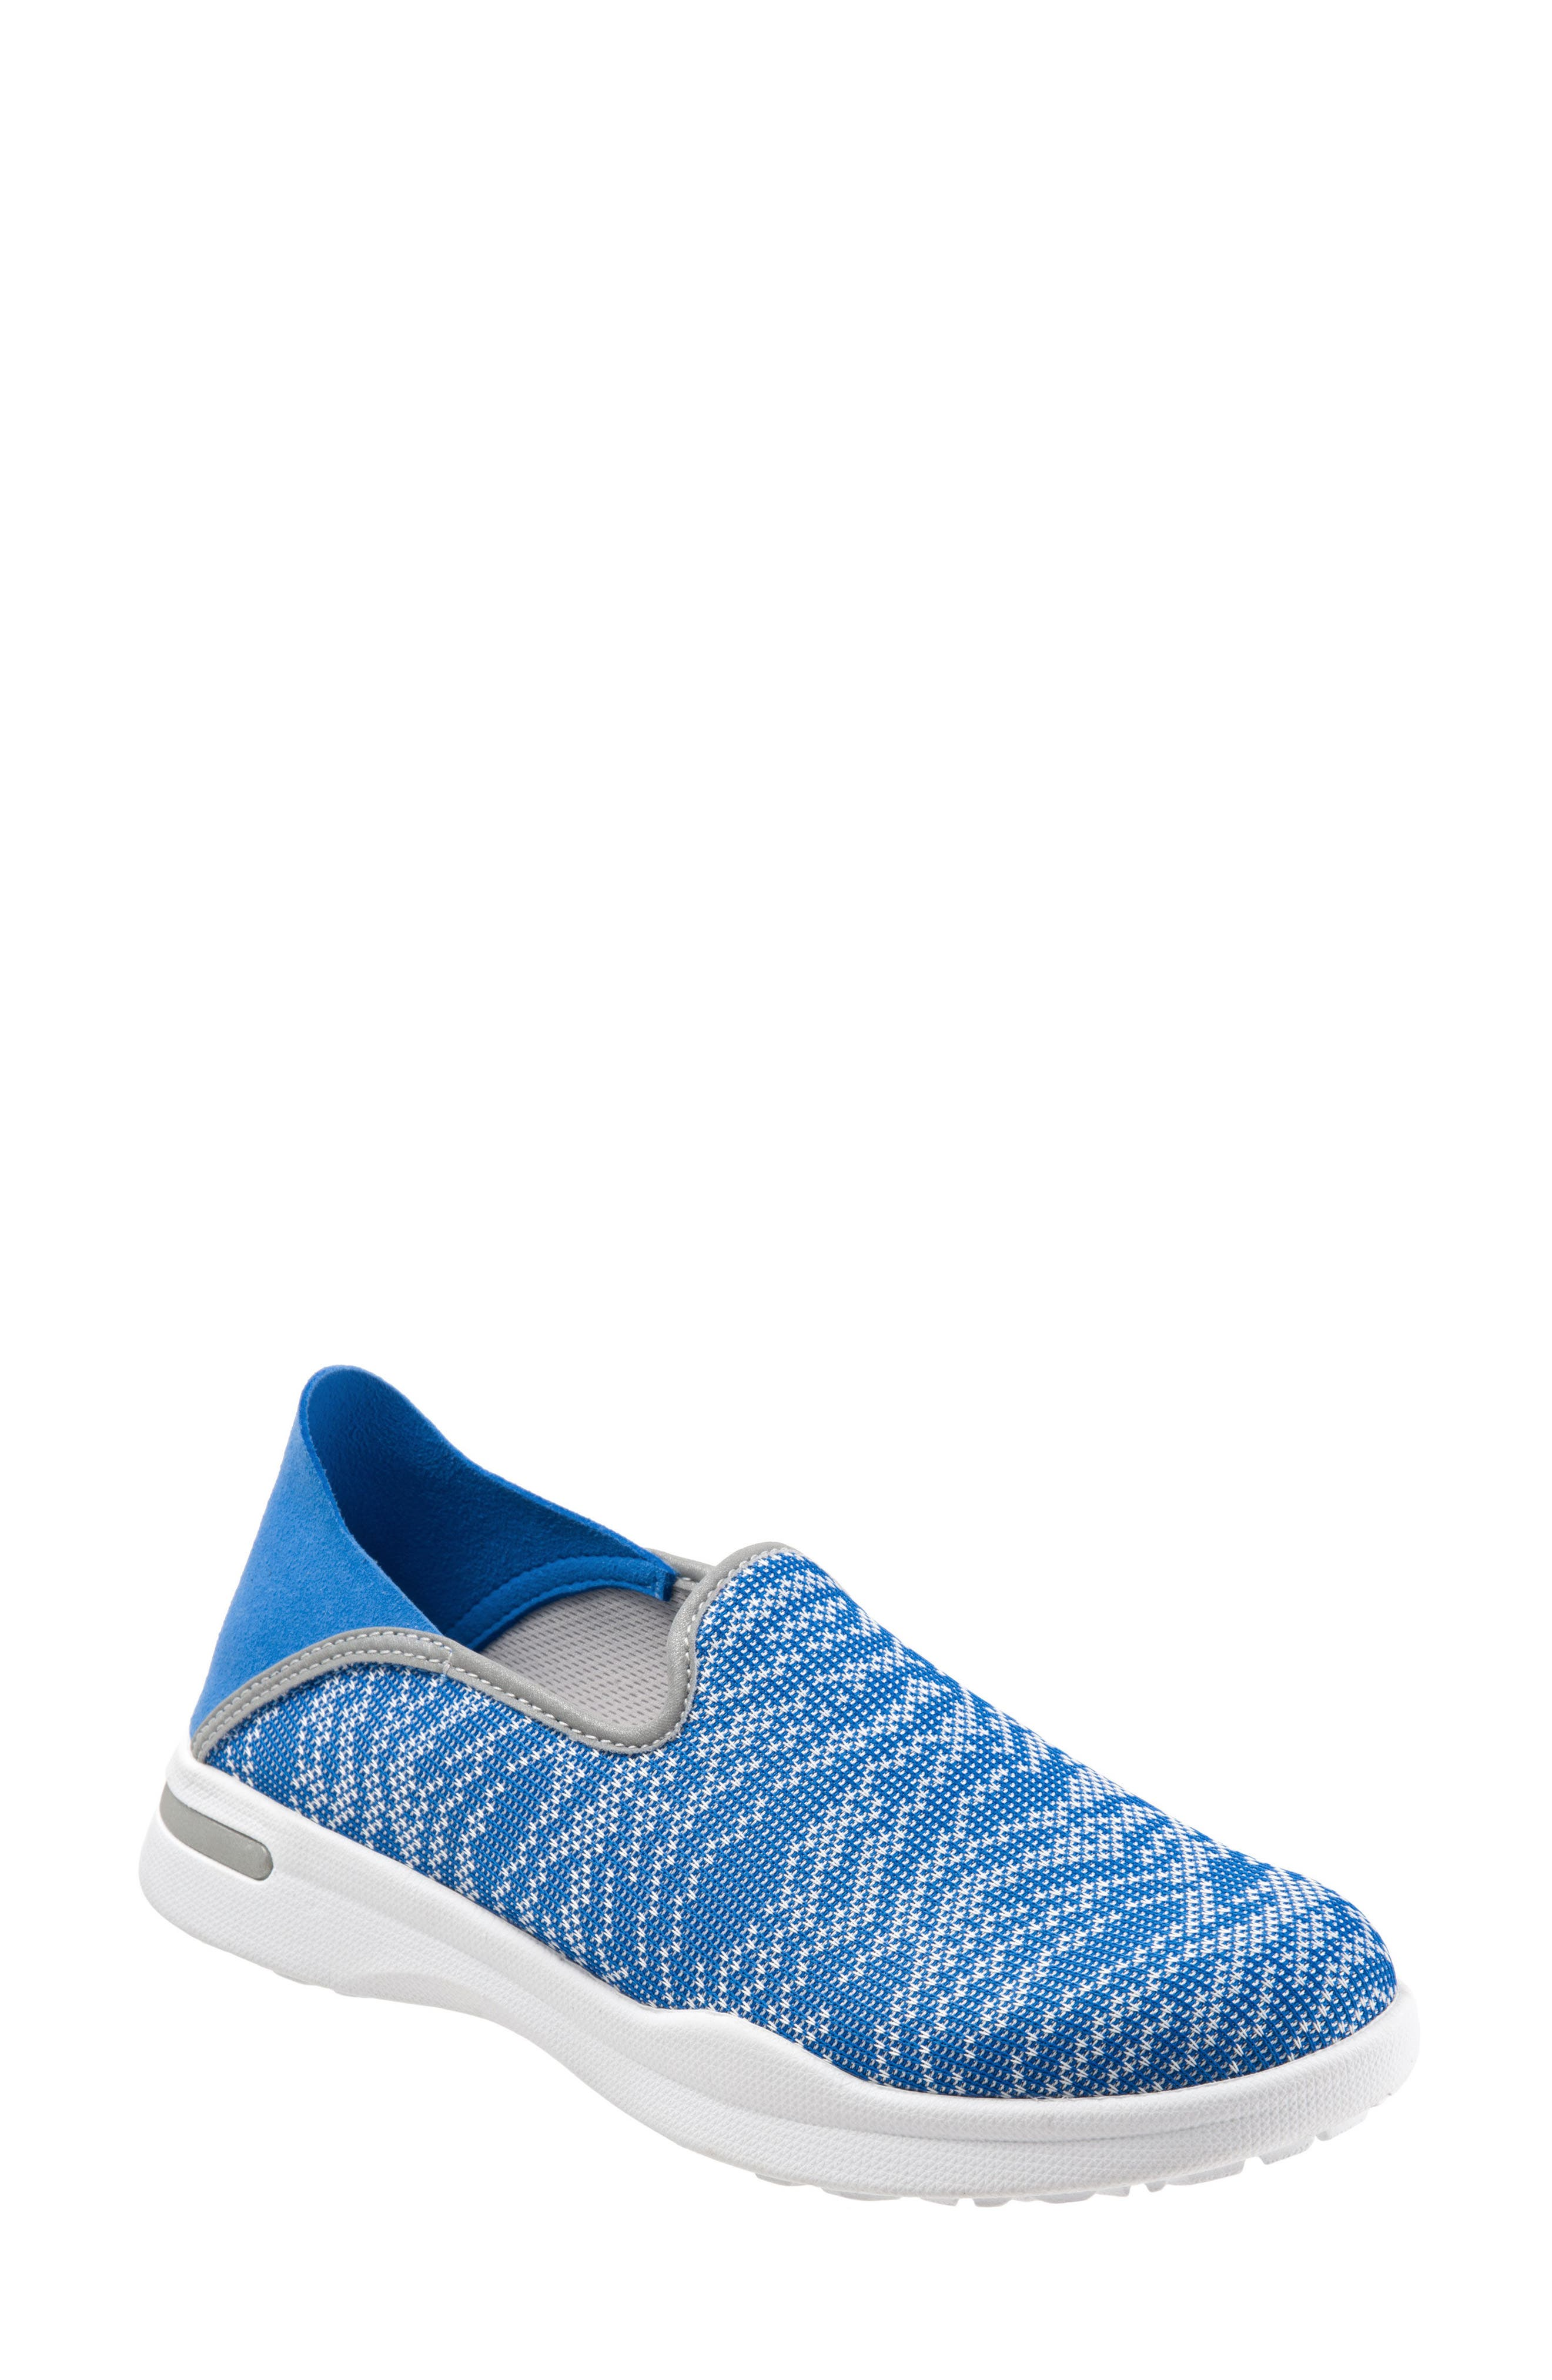 Main Image - SoftWalk® Convertible Slip-On Sneaker (Women)